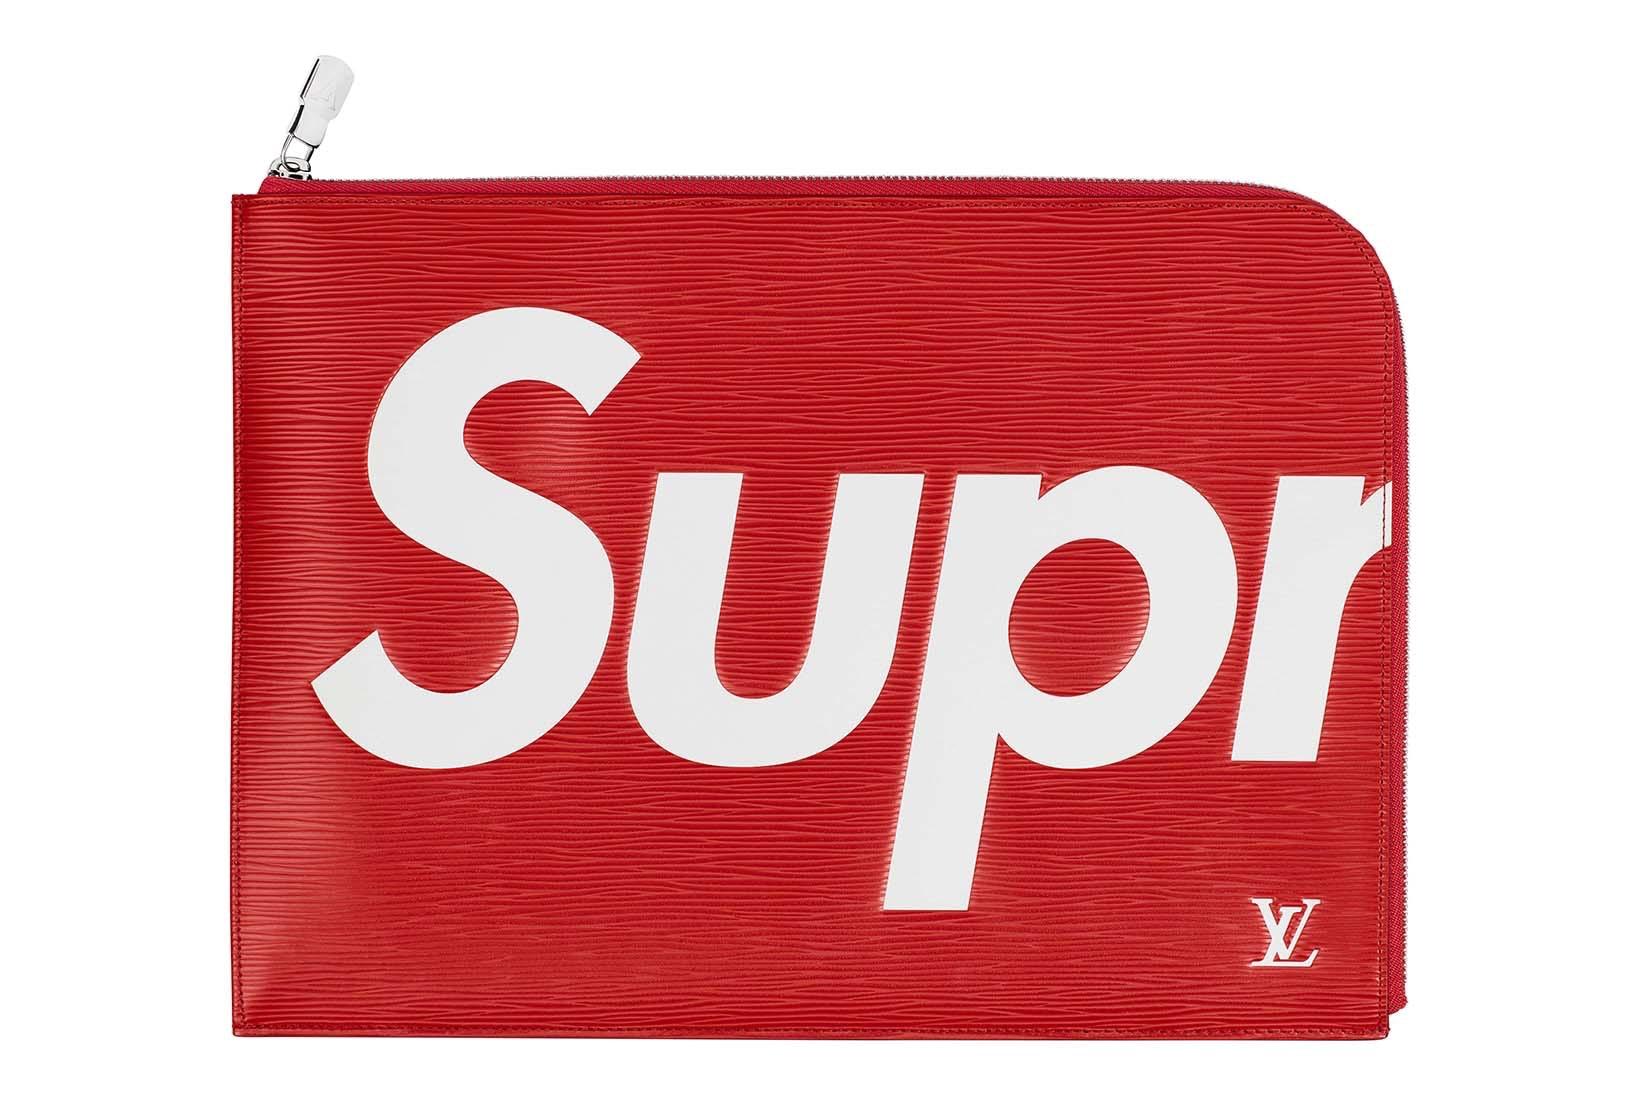 Supreme(シュプリーム)×Louis Vuitton(ルイ・ヴィトン) / ポシェット・ジュールGM(Pochette Jour GM)